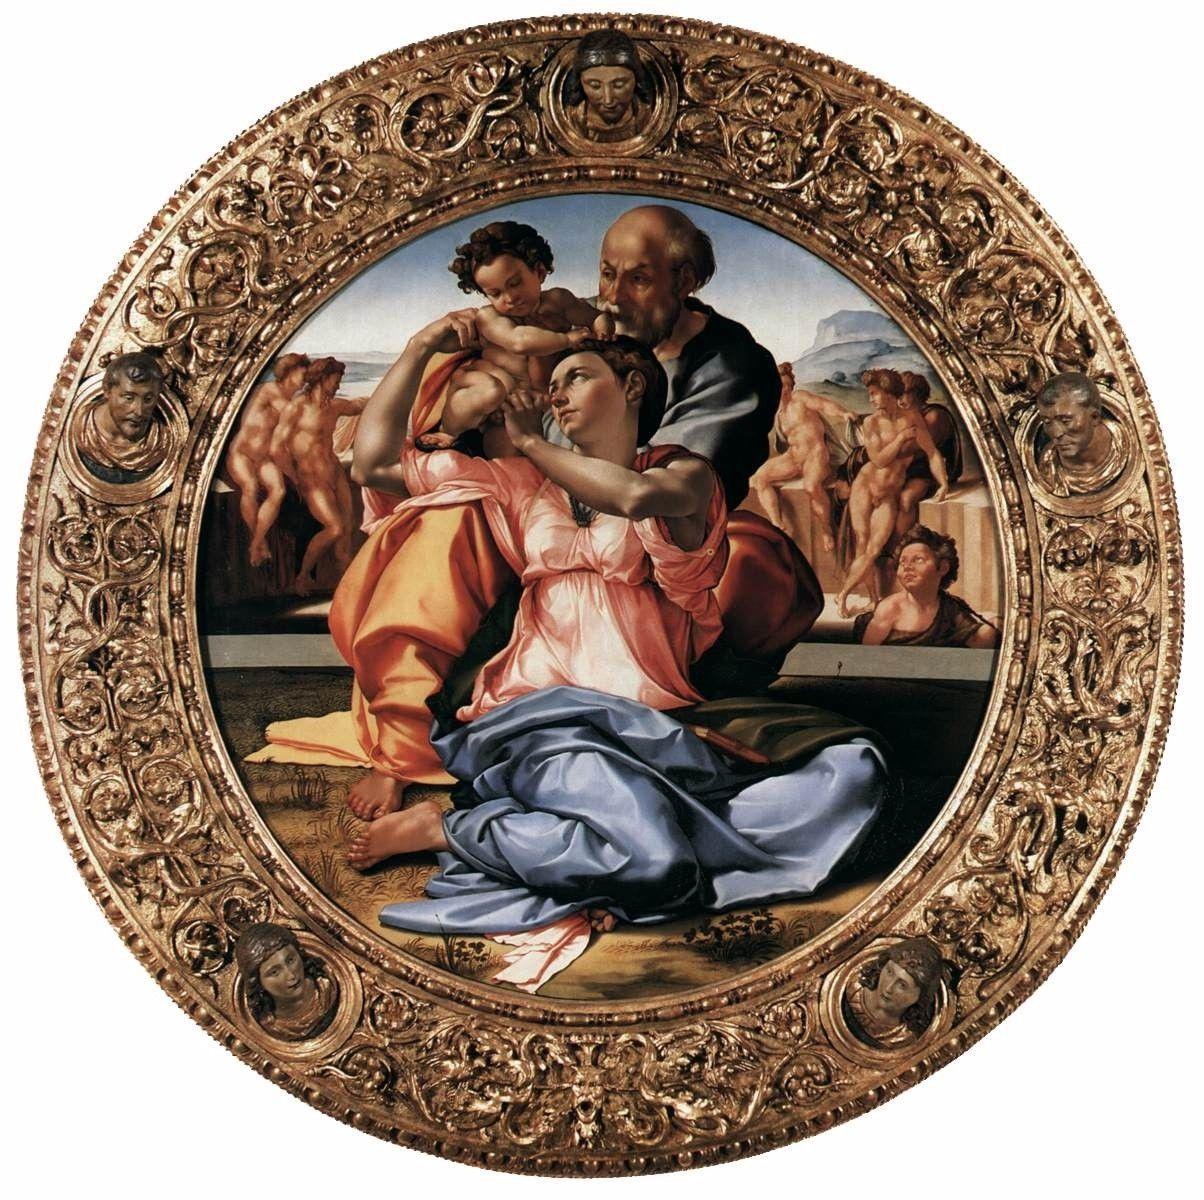 Tondo Doni O Tondo De La Sagrada Familia Con San Juan Bautista 1506 Temple Sobre Tabla Galleria Degli Uffici Arte Renacentista Arte Pinturas Renacentistas